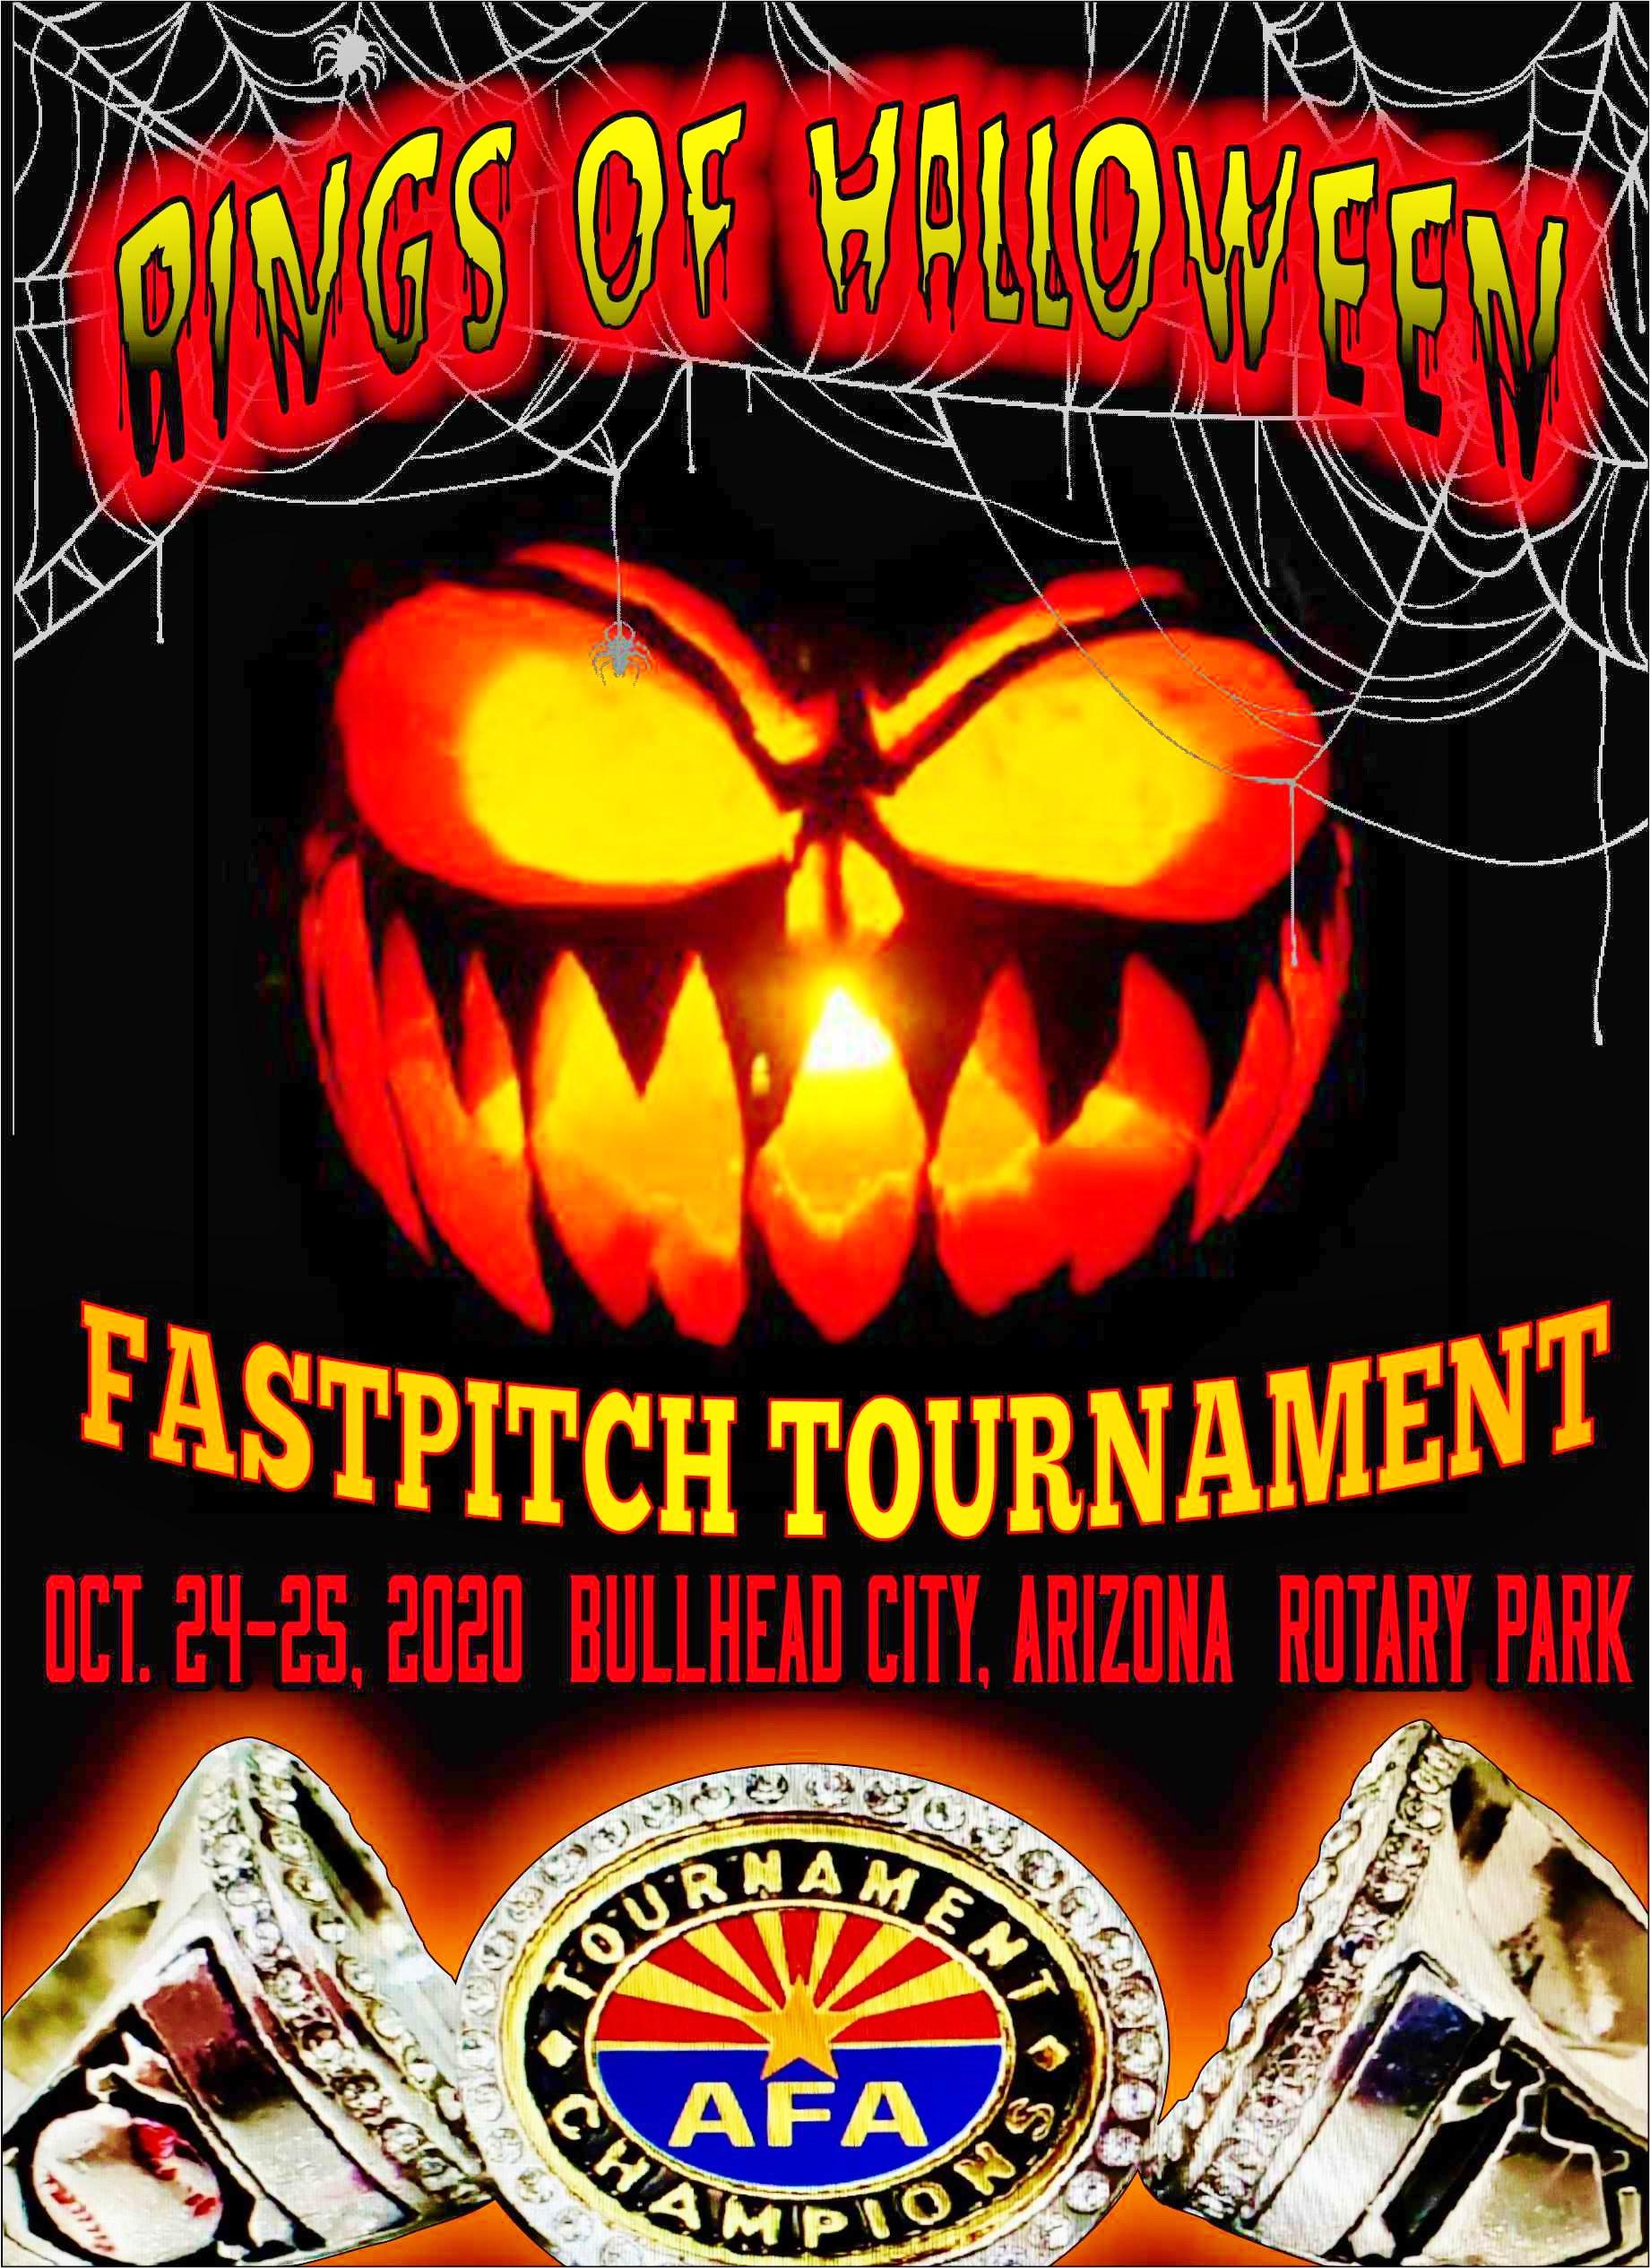 Halloween Az 2020 2020 Rings of Halloween Fastpitch Tournament – 10U/12U/14U/16U/18U